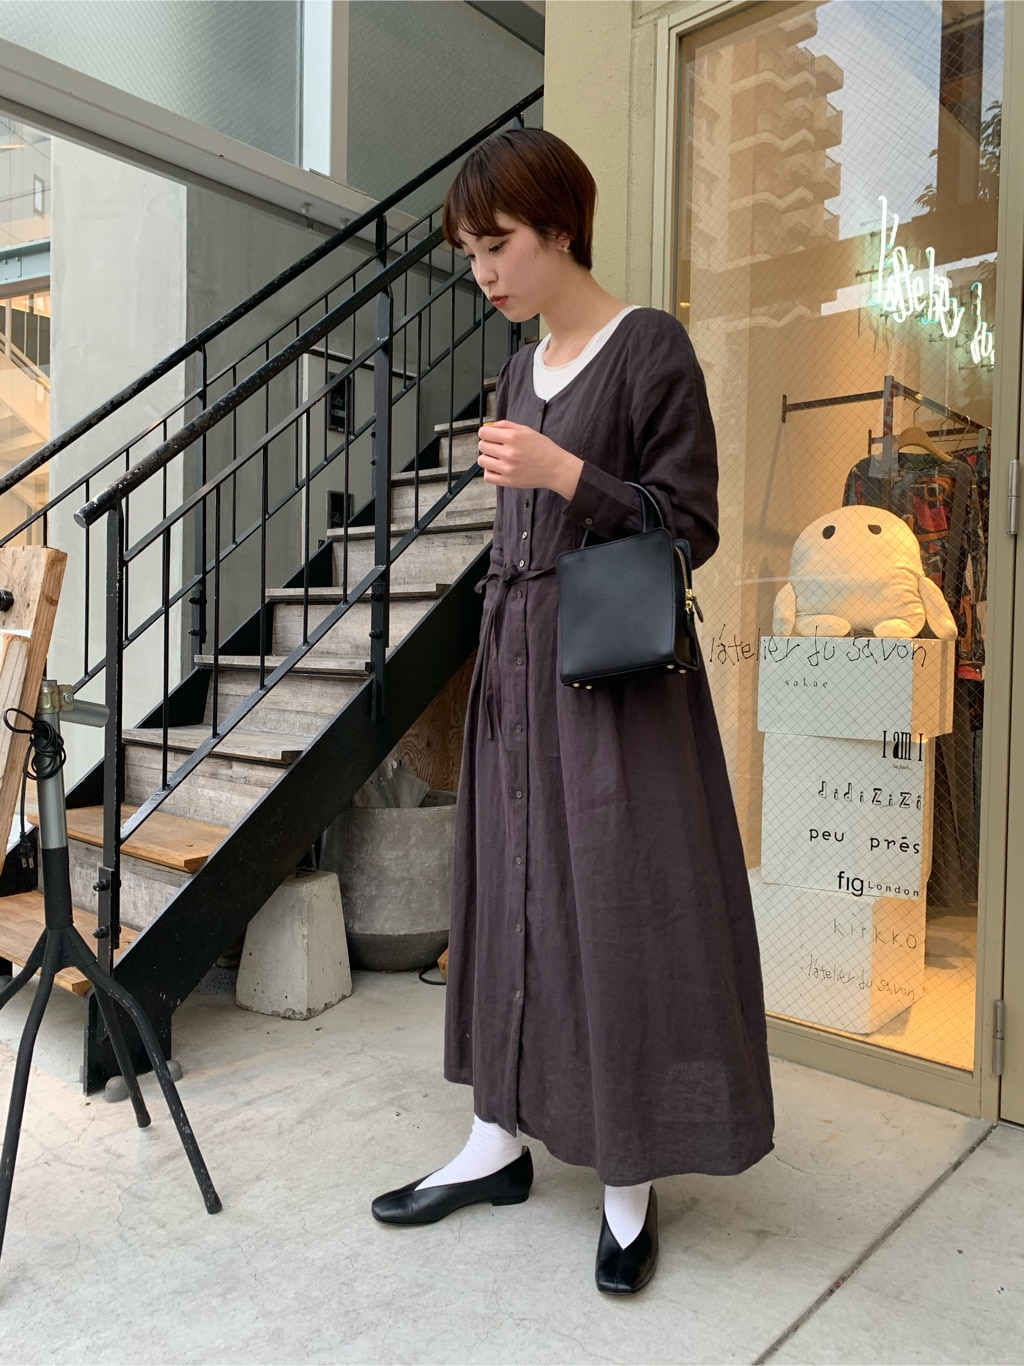 l'atelier du savon 名古屋栄路面 身長:161cm 2020.04.14